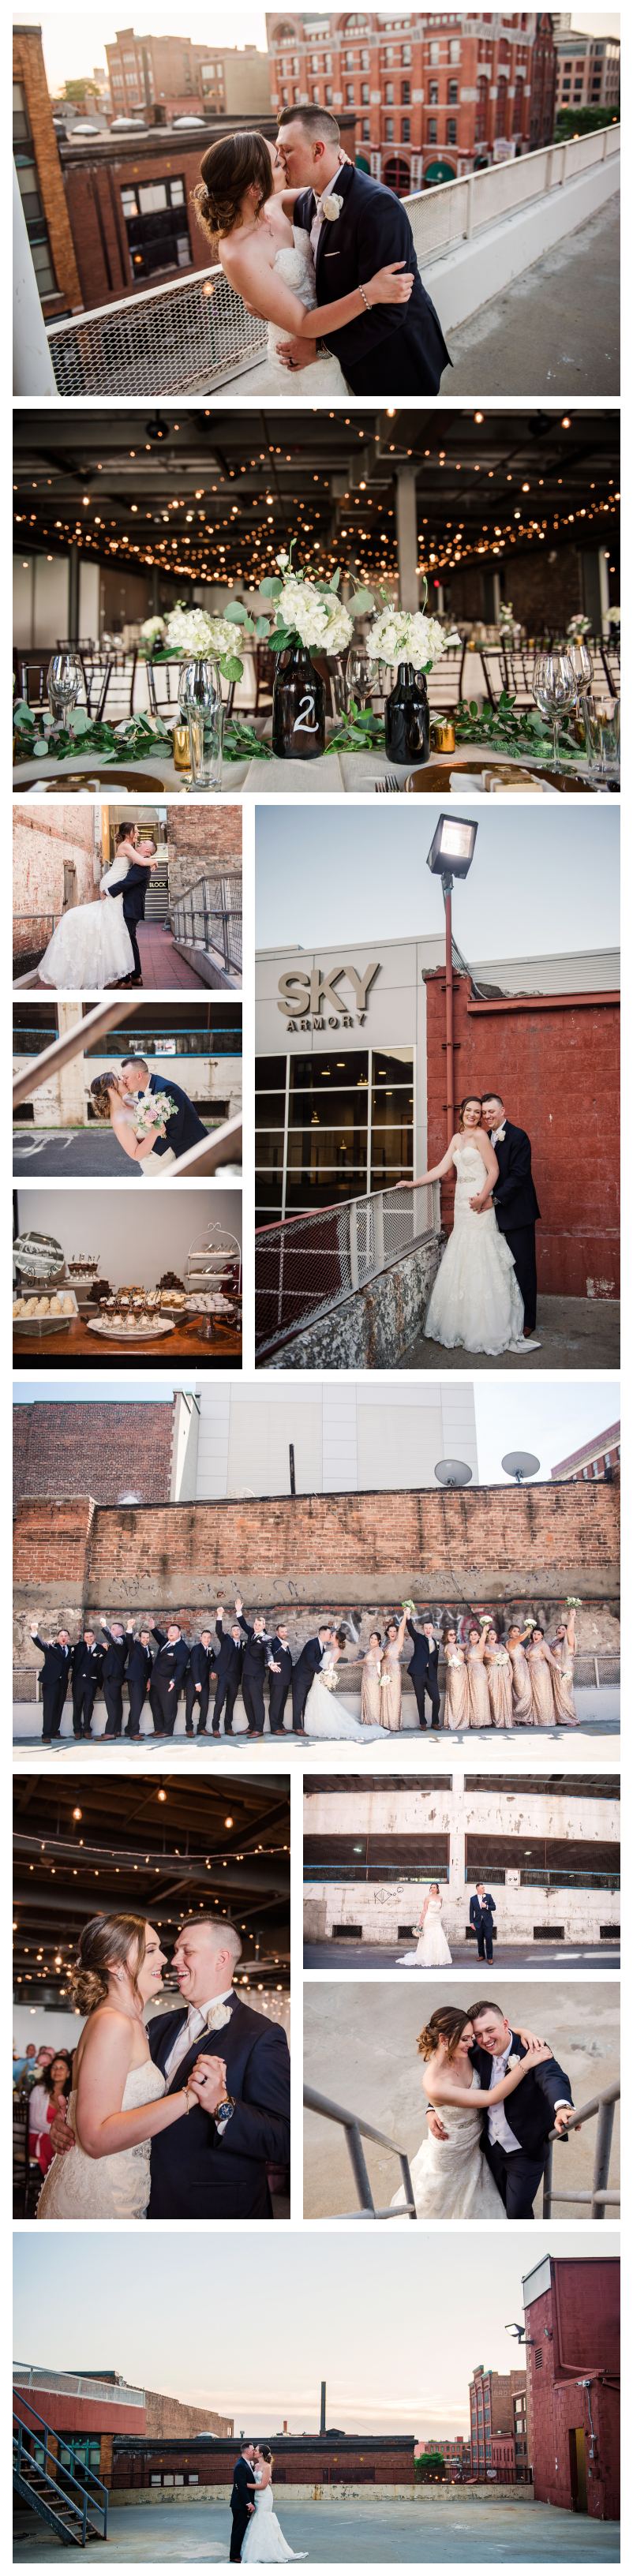 SKY_Armory_Rochester_Wedding_JILL_STUDIO_2.jpg